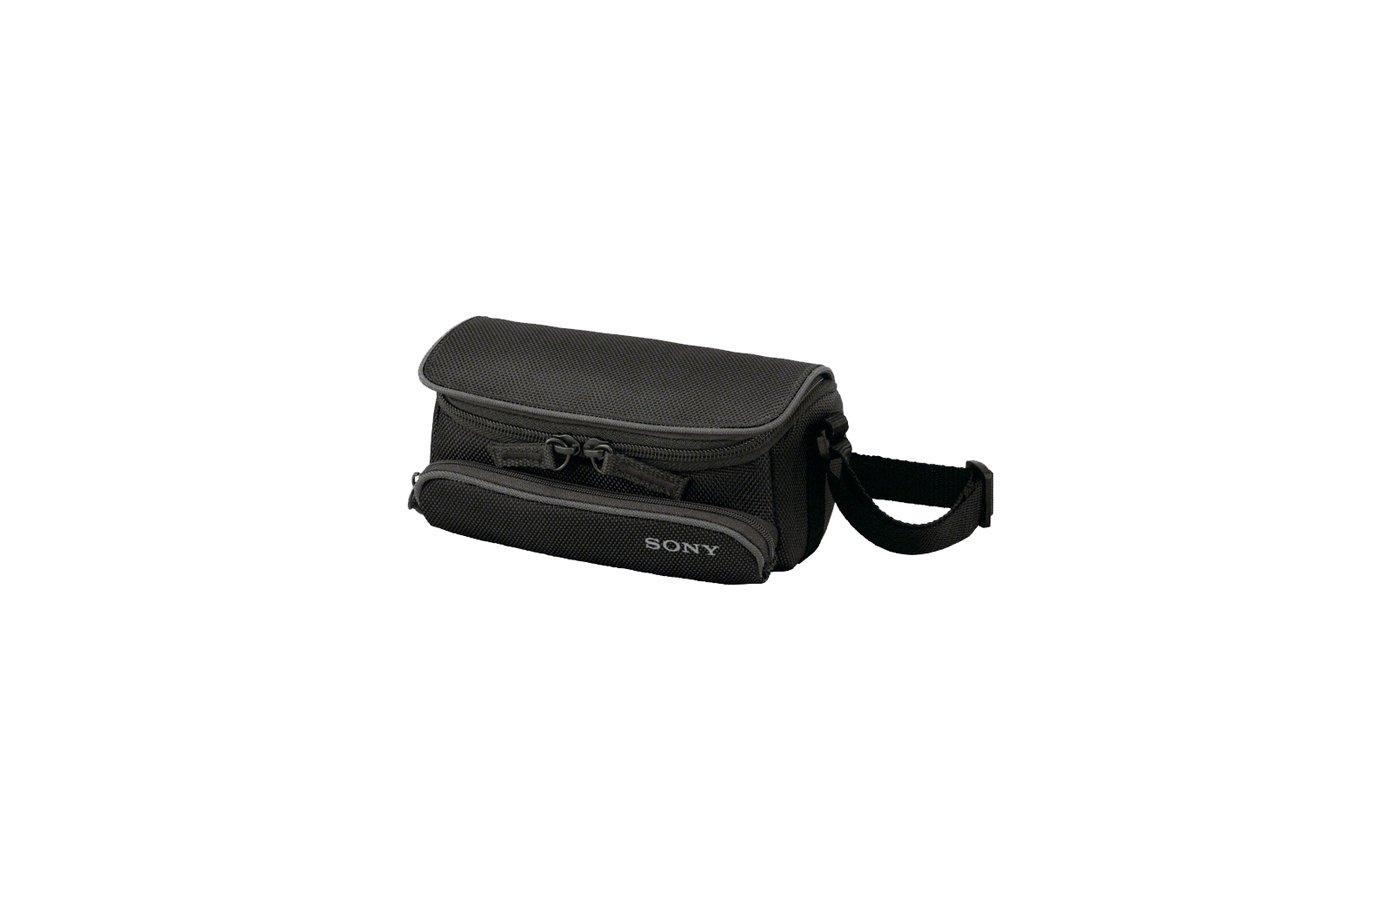 Сумка для фотоаппарата Sony LCS-U5B